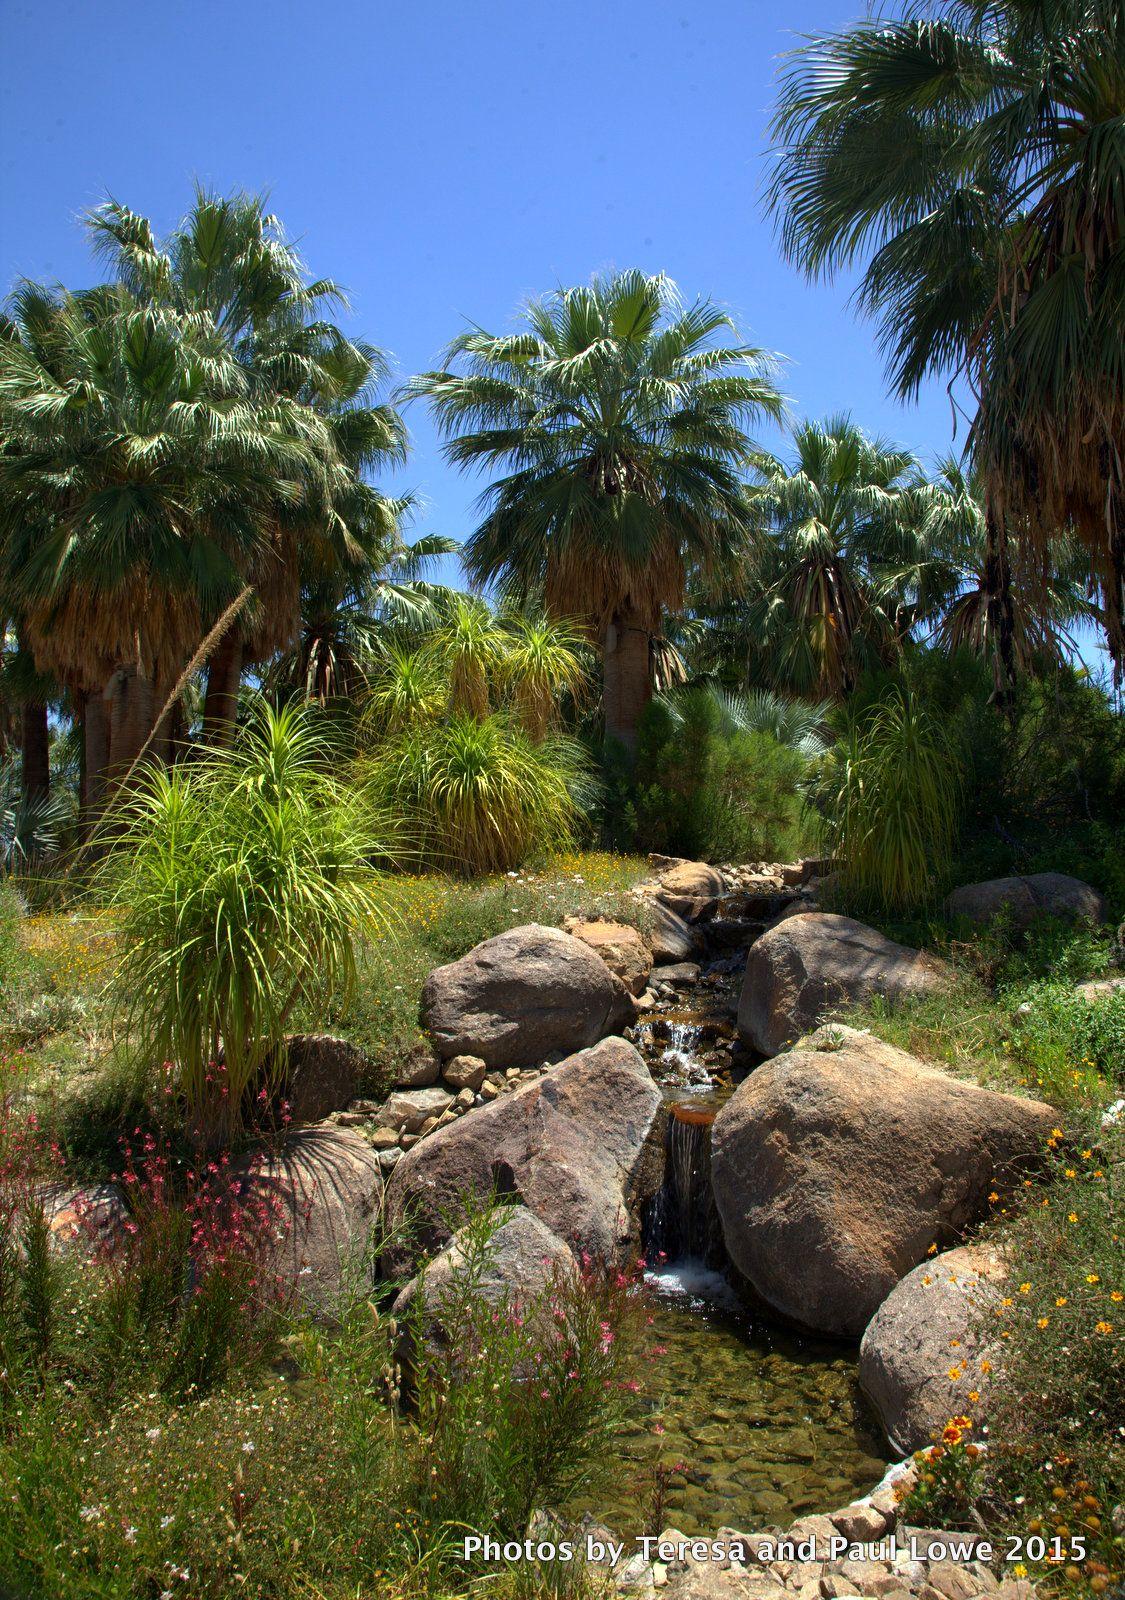 5ebfc41b6ef0ebc6741c2a8013f104c9 - The Living Desert Zoo And Gardens Palm Desert California